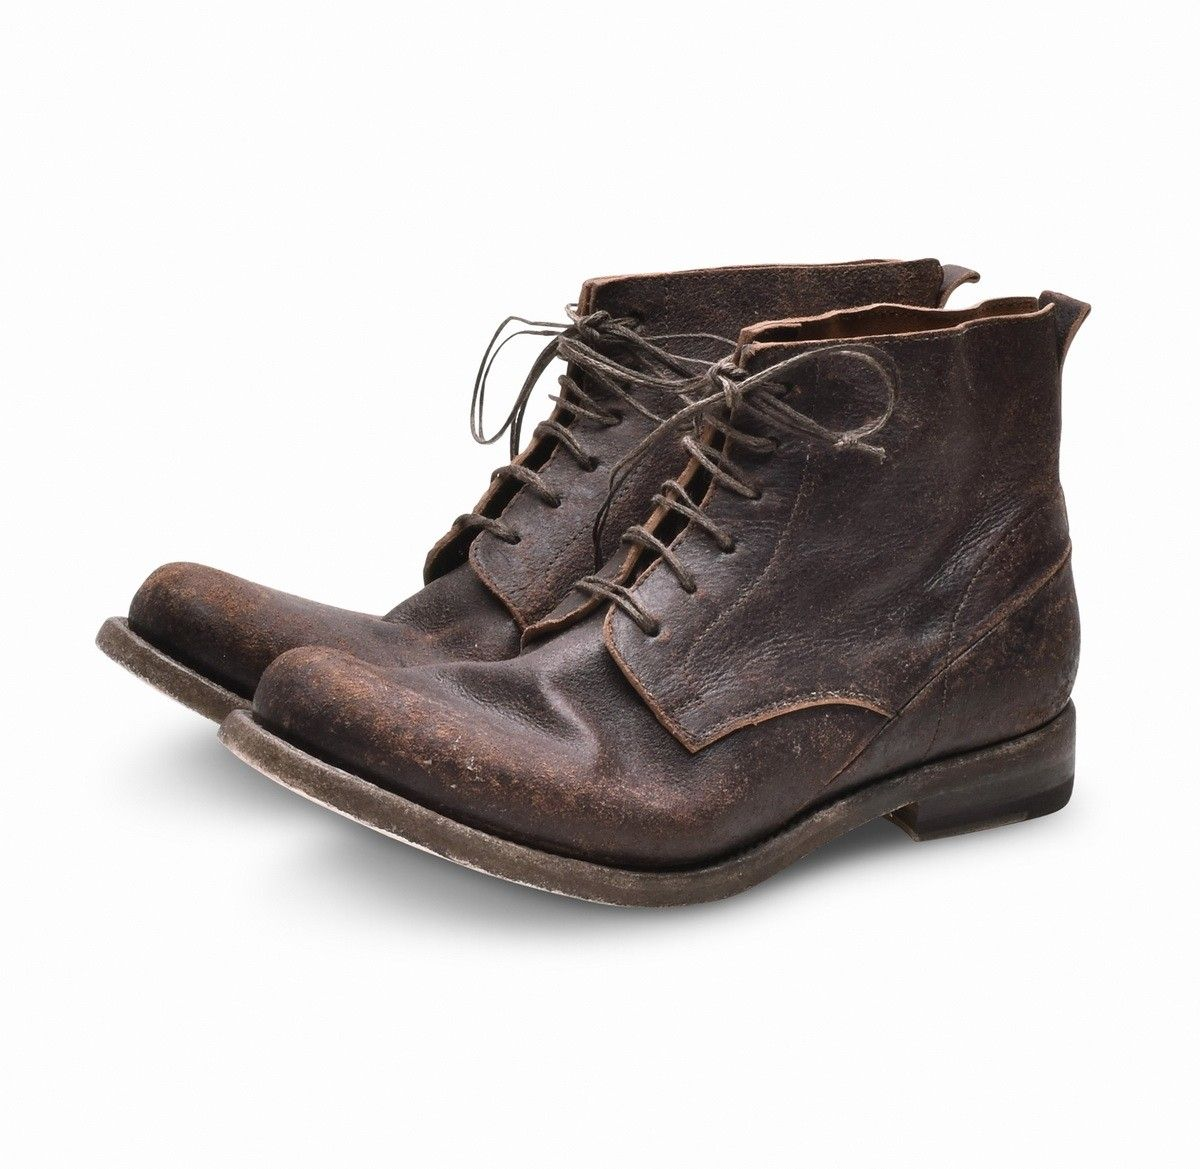 SHOTO - Herren Schuhe - Horse Front Brown Washed Cuoio 04